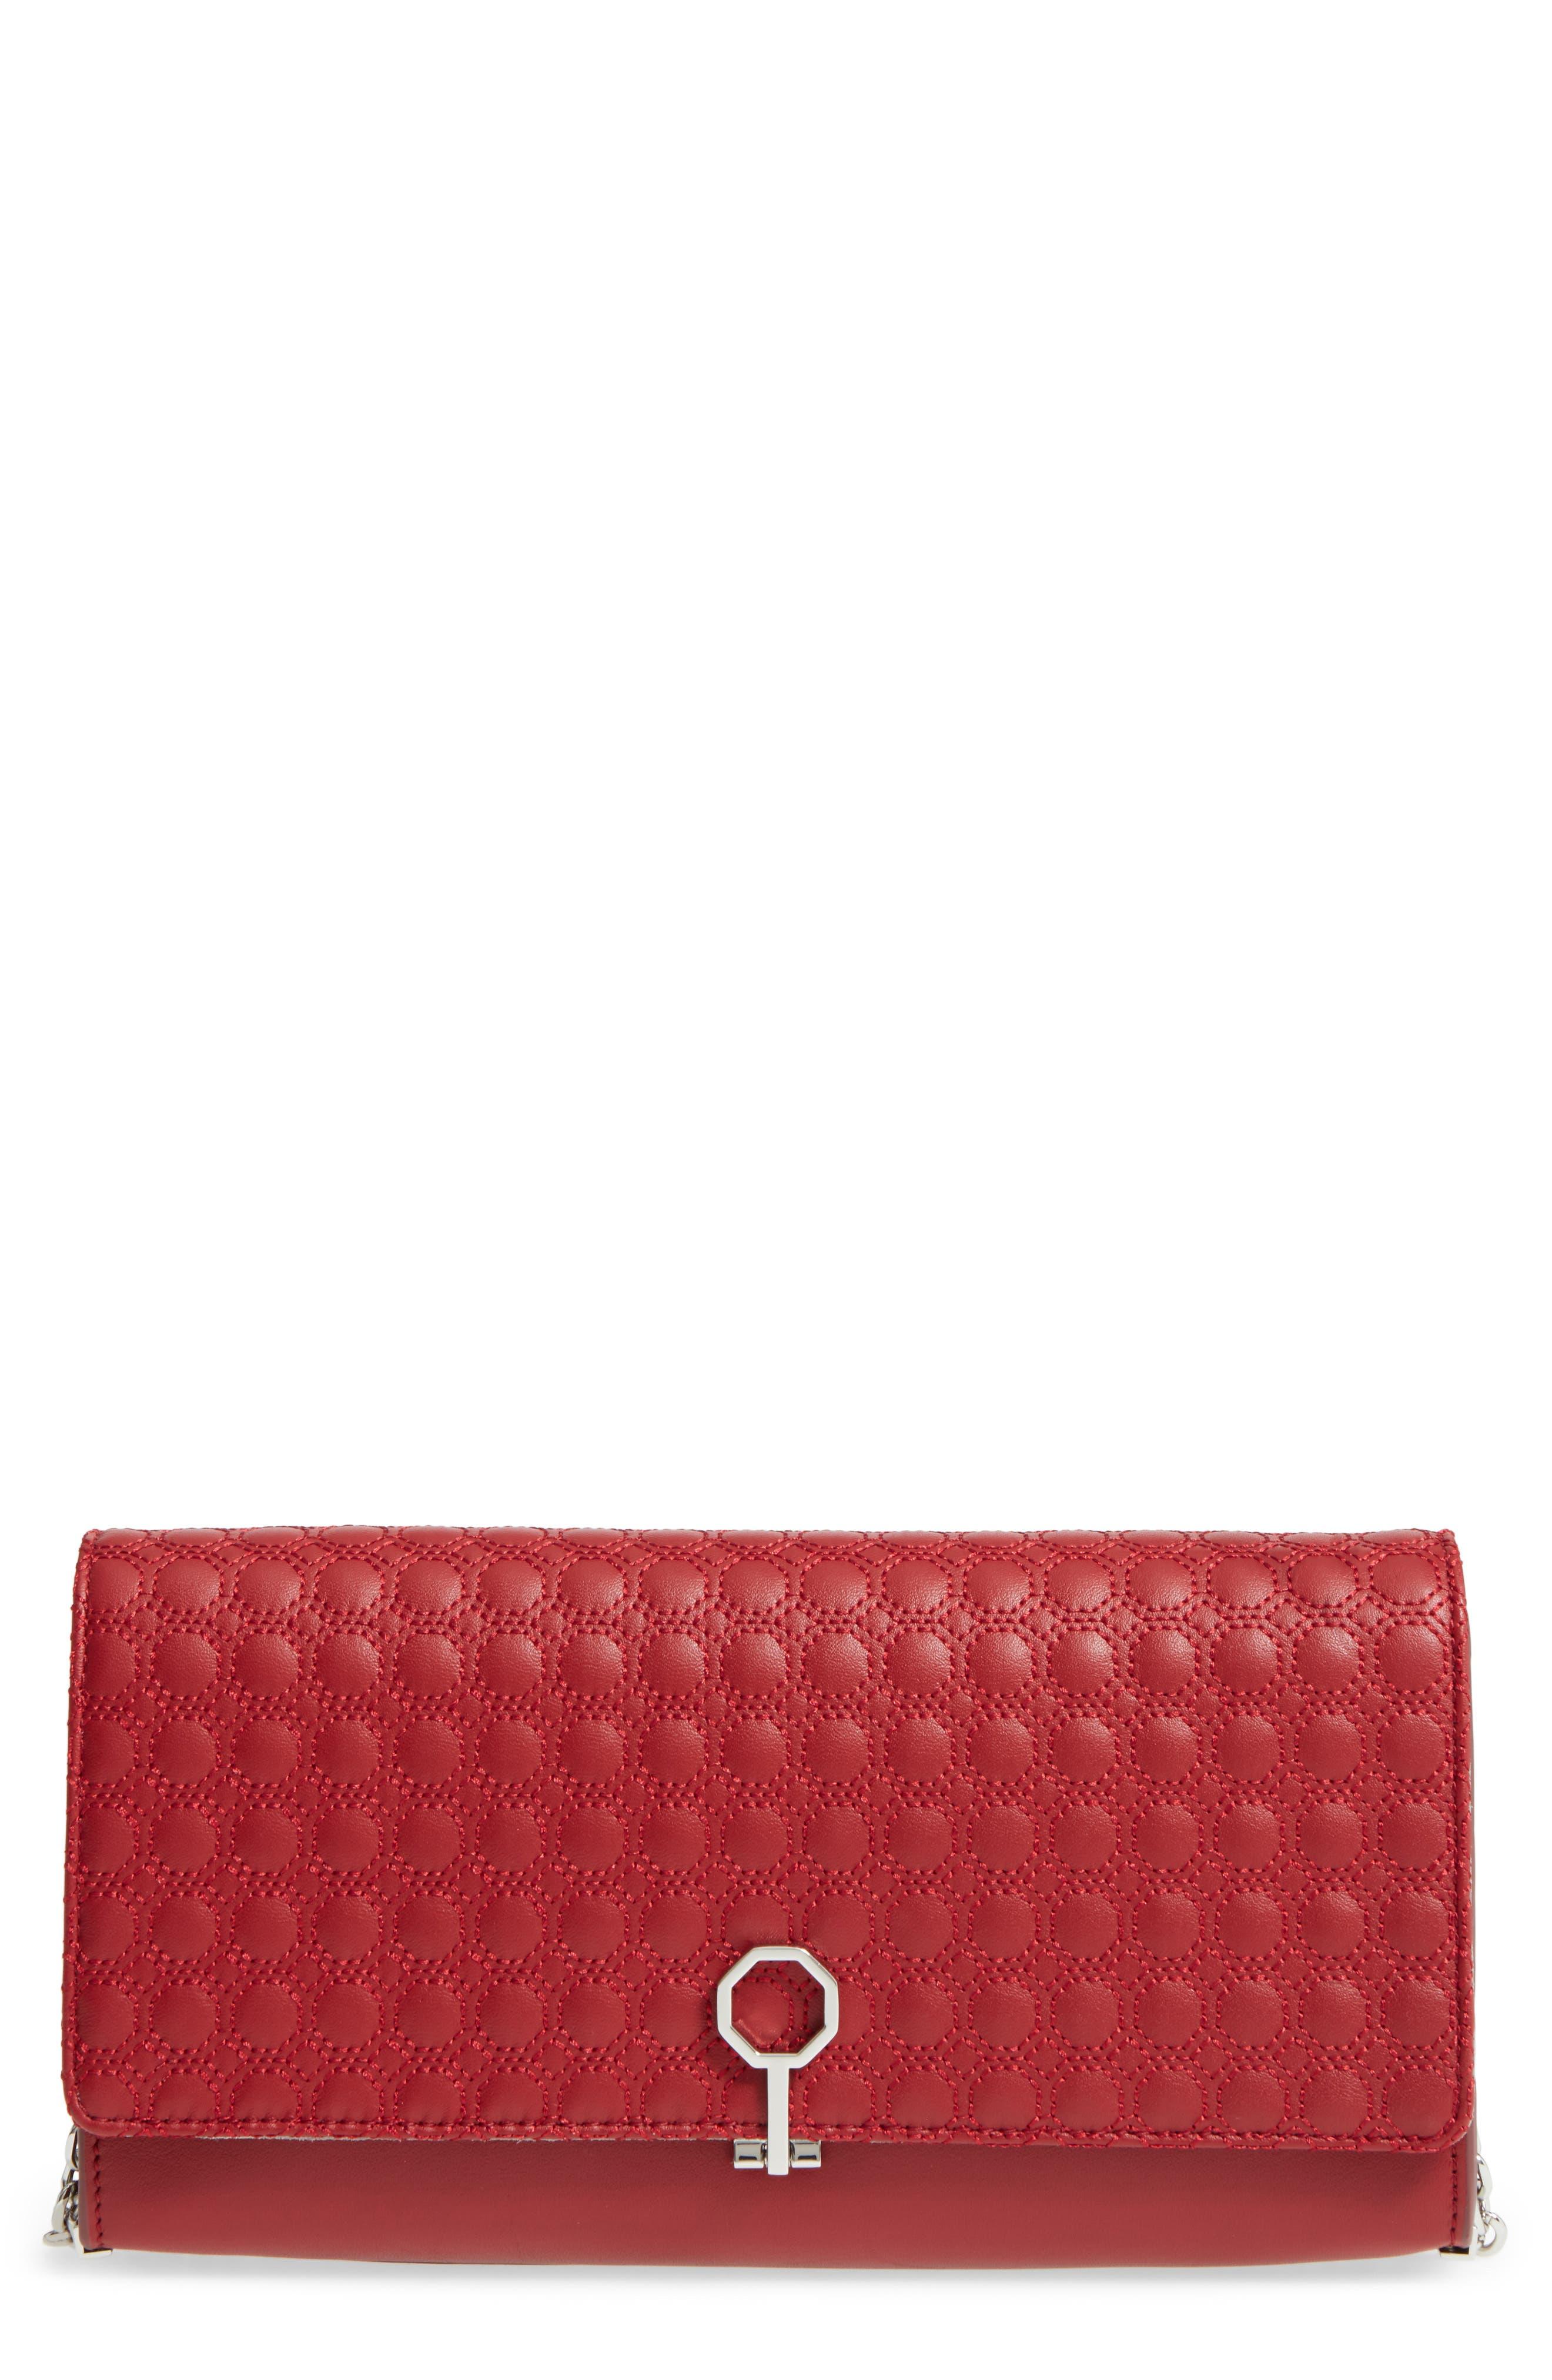 'Yvet' Leather Flap Clutch,                             Main thumbnail 1, color,                             600